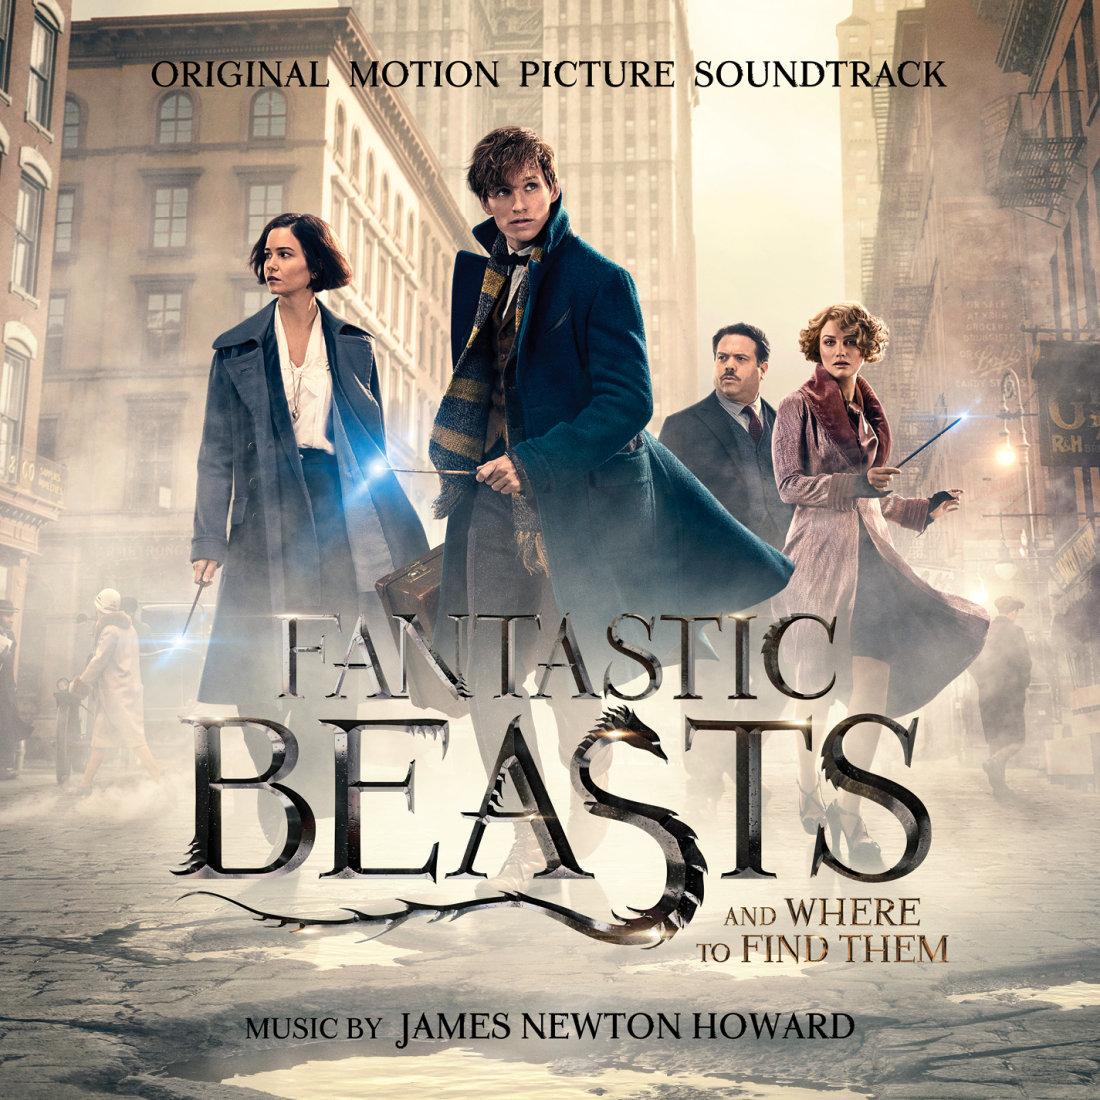 Fantastic_Beasts_Standard_Sdtk_Cover_01_1425px_RGB